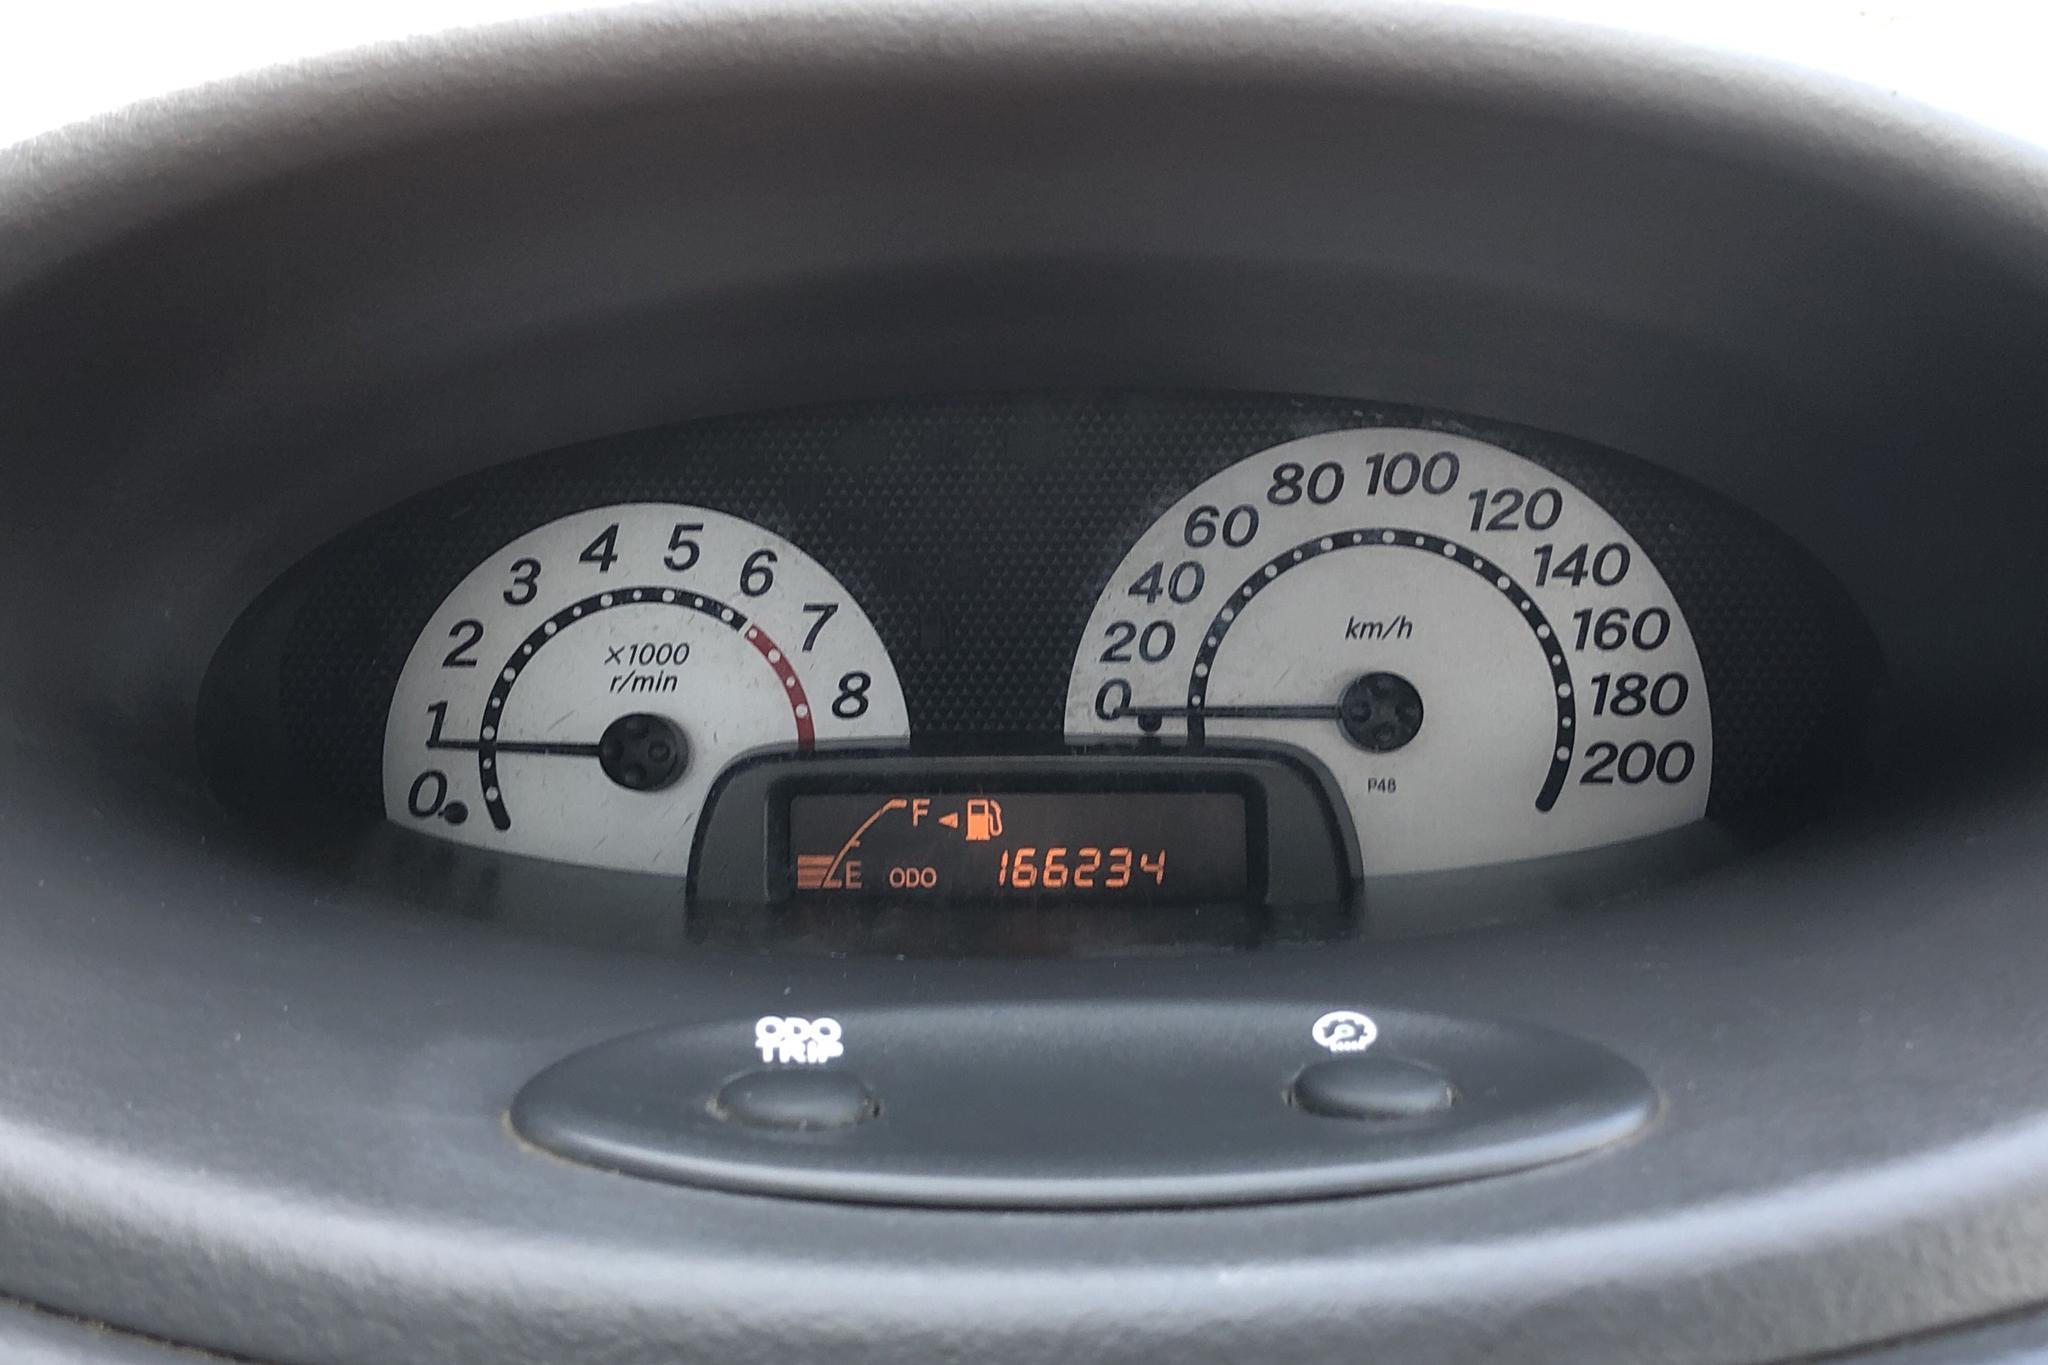 Toyota Yaris 1.5 TS 5dr (106hk) - 16 623 mil - Manuell - gul - 2001